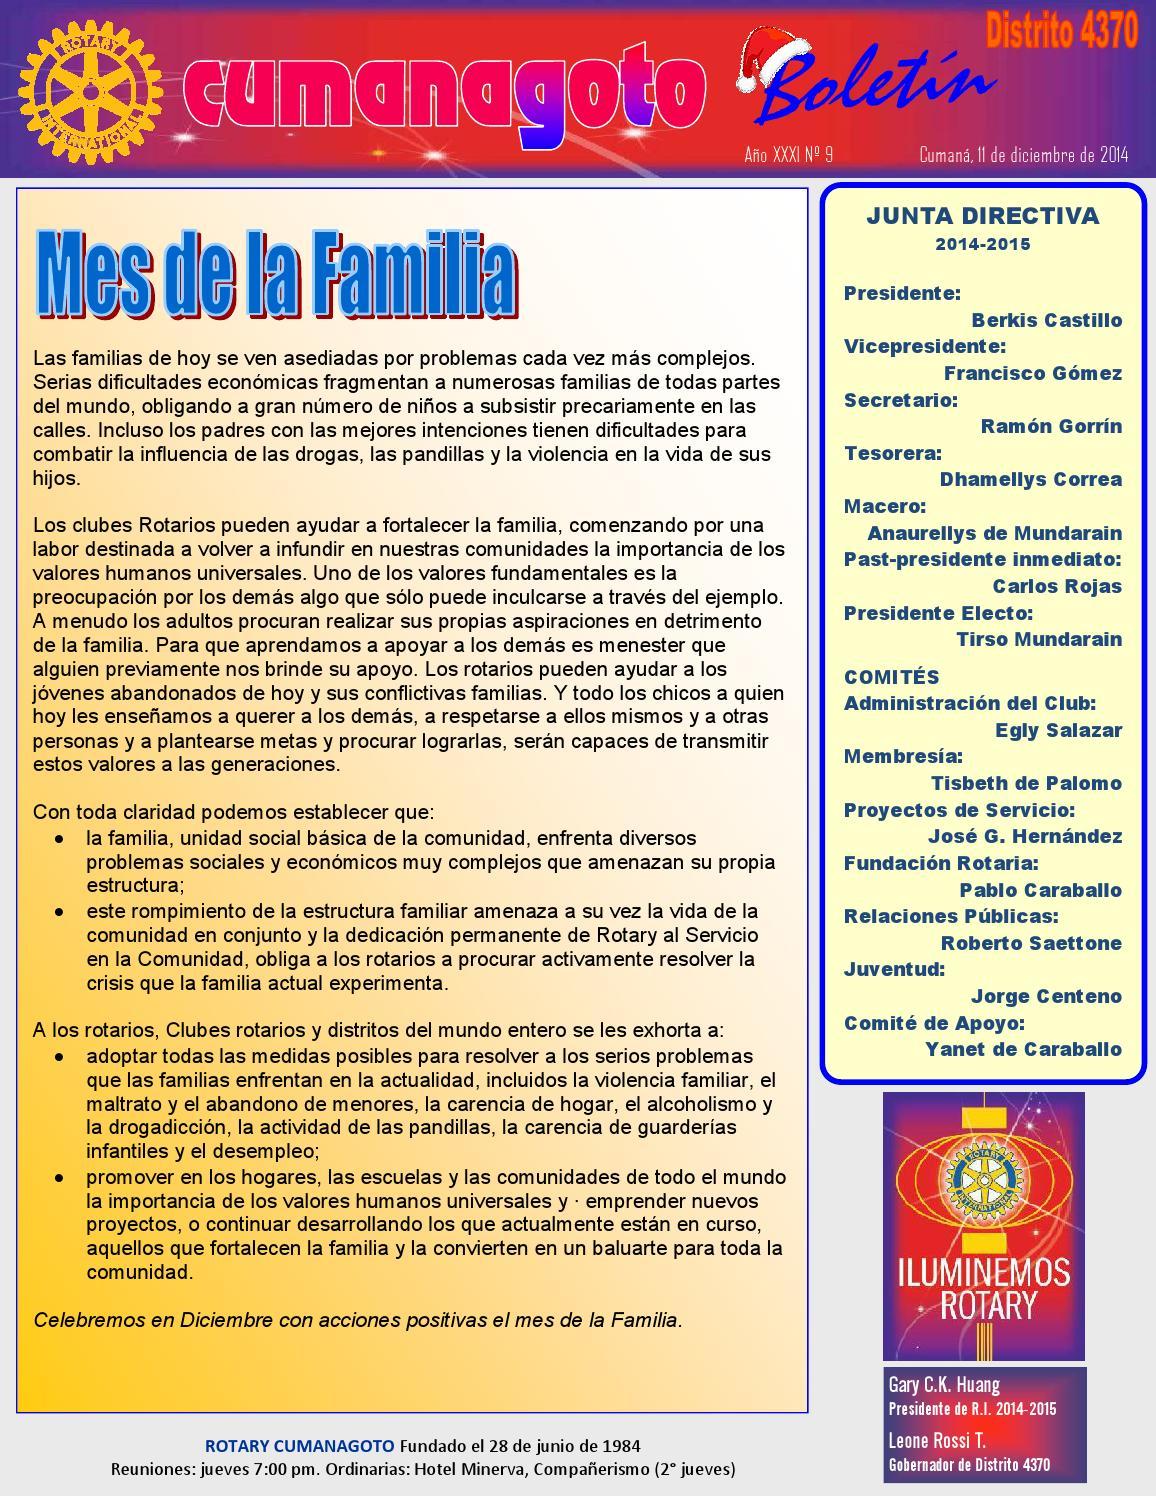 Boletin Rotary Cumanagoto 14 12 11 By Rotary Cumanagoto Issuu